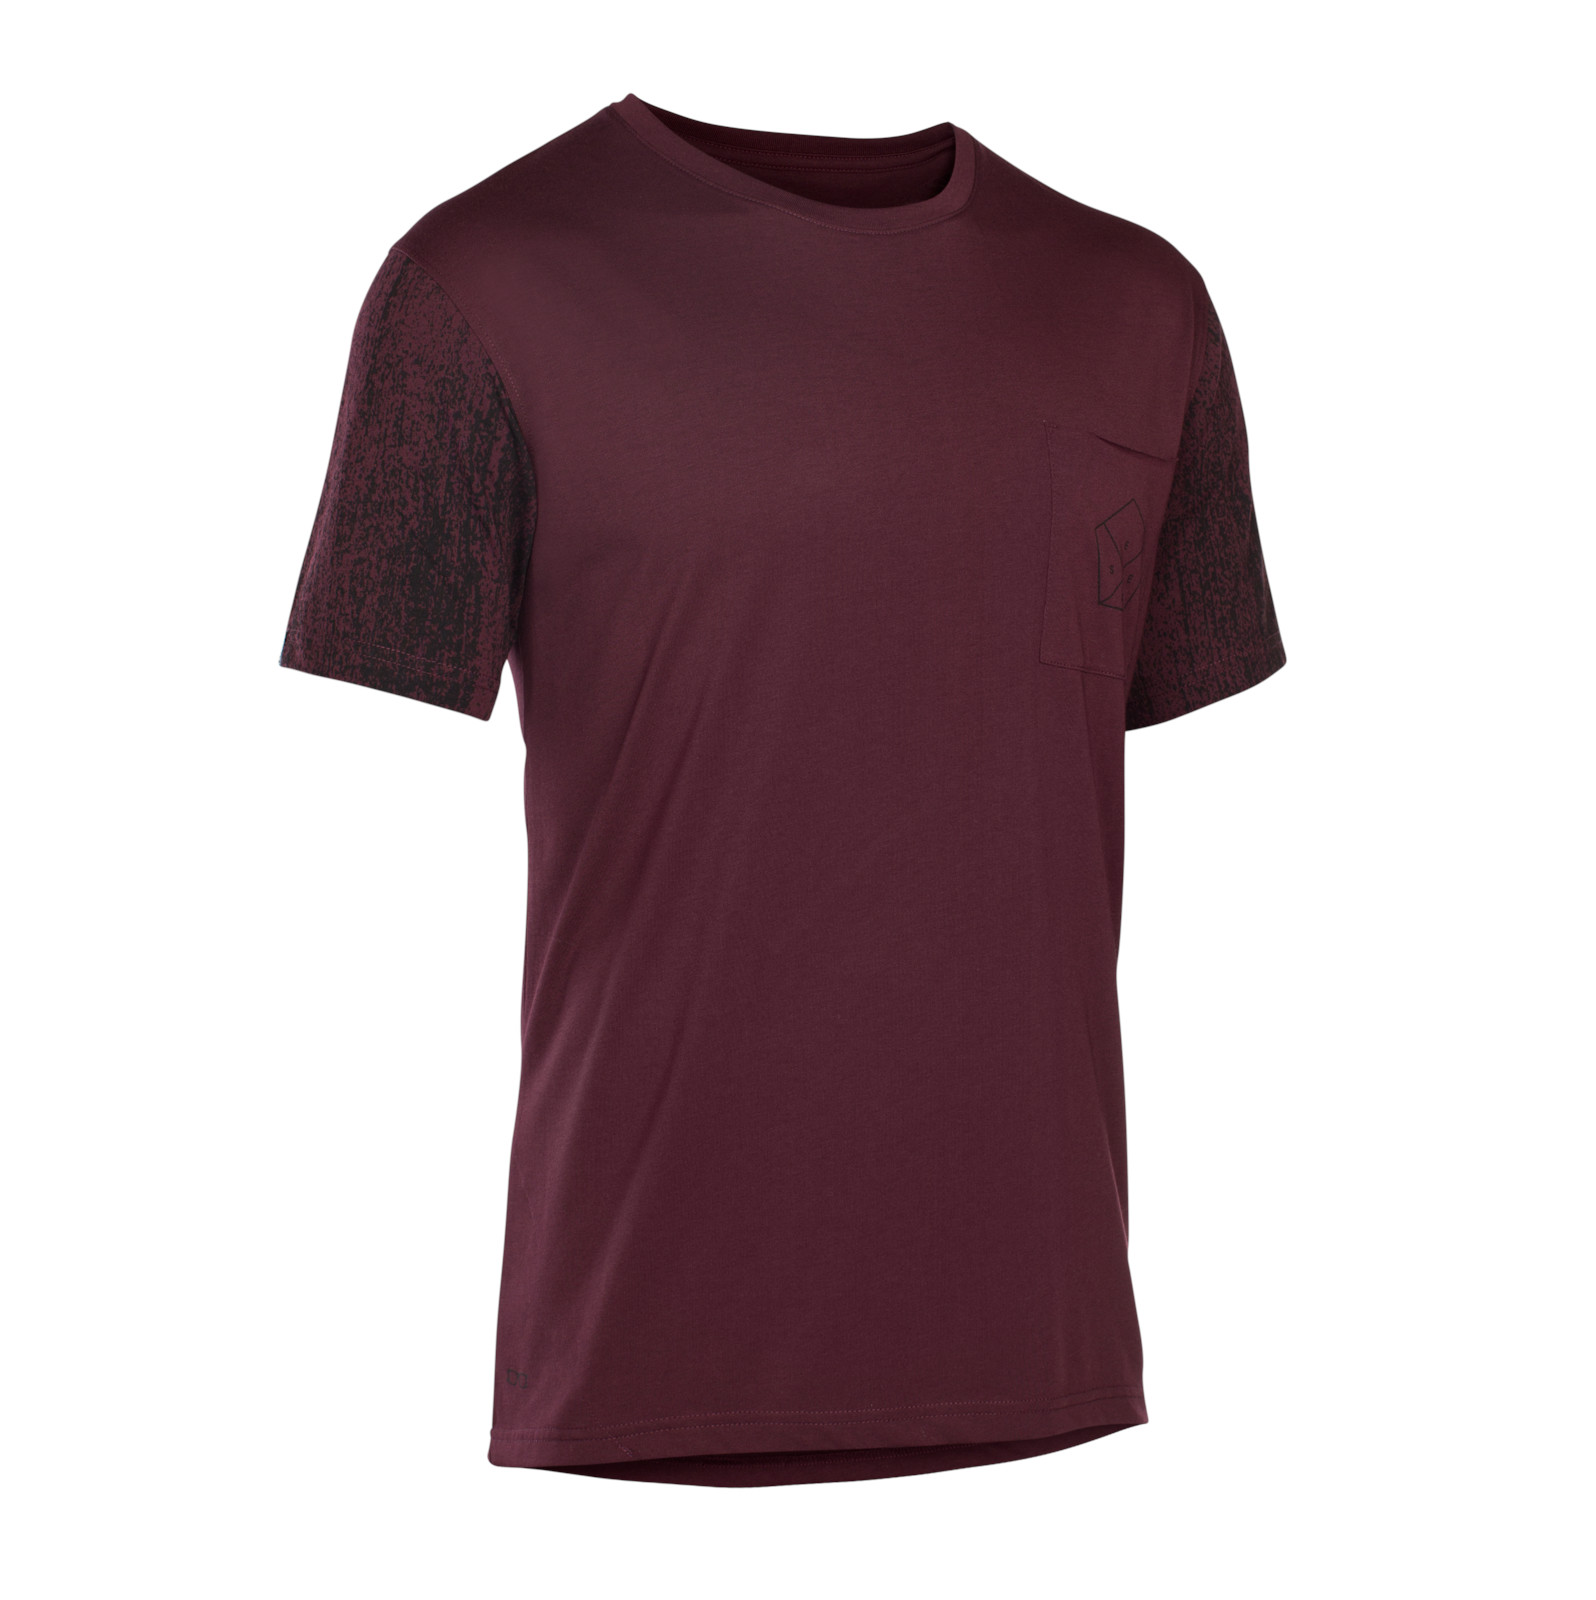 ION Seek Amp Short-Sleeve (vinaceous)